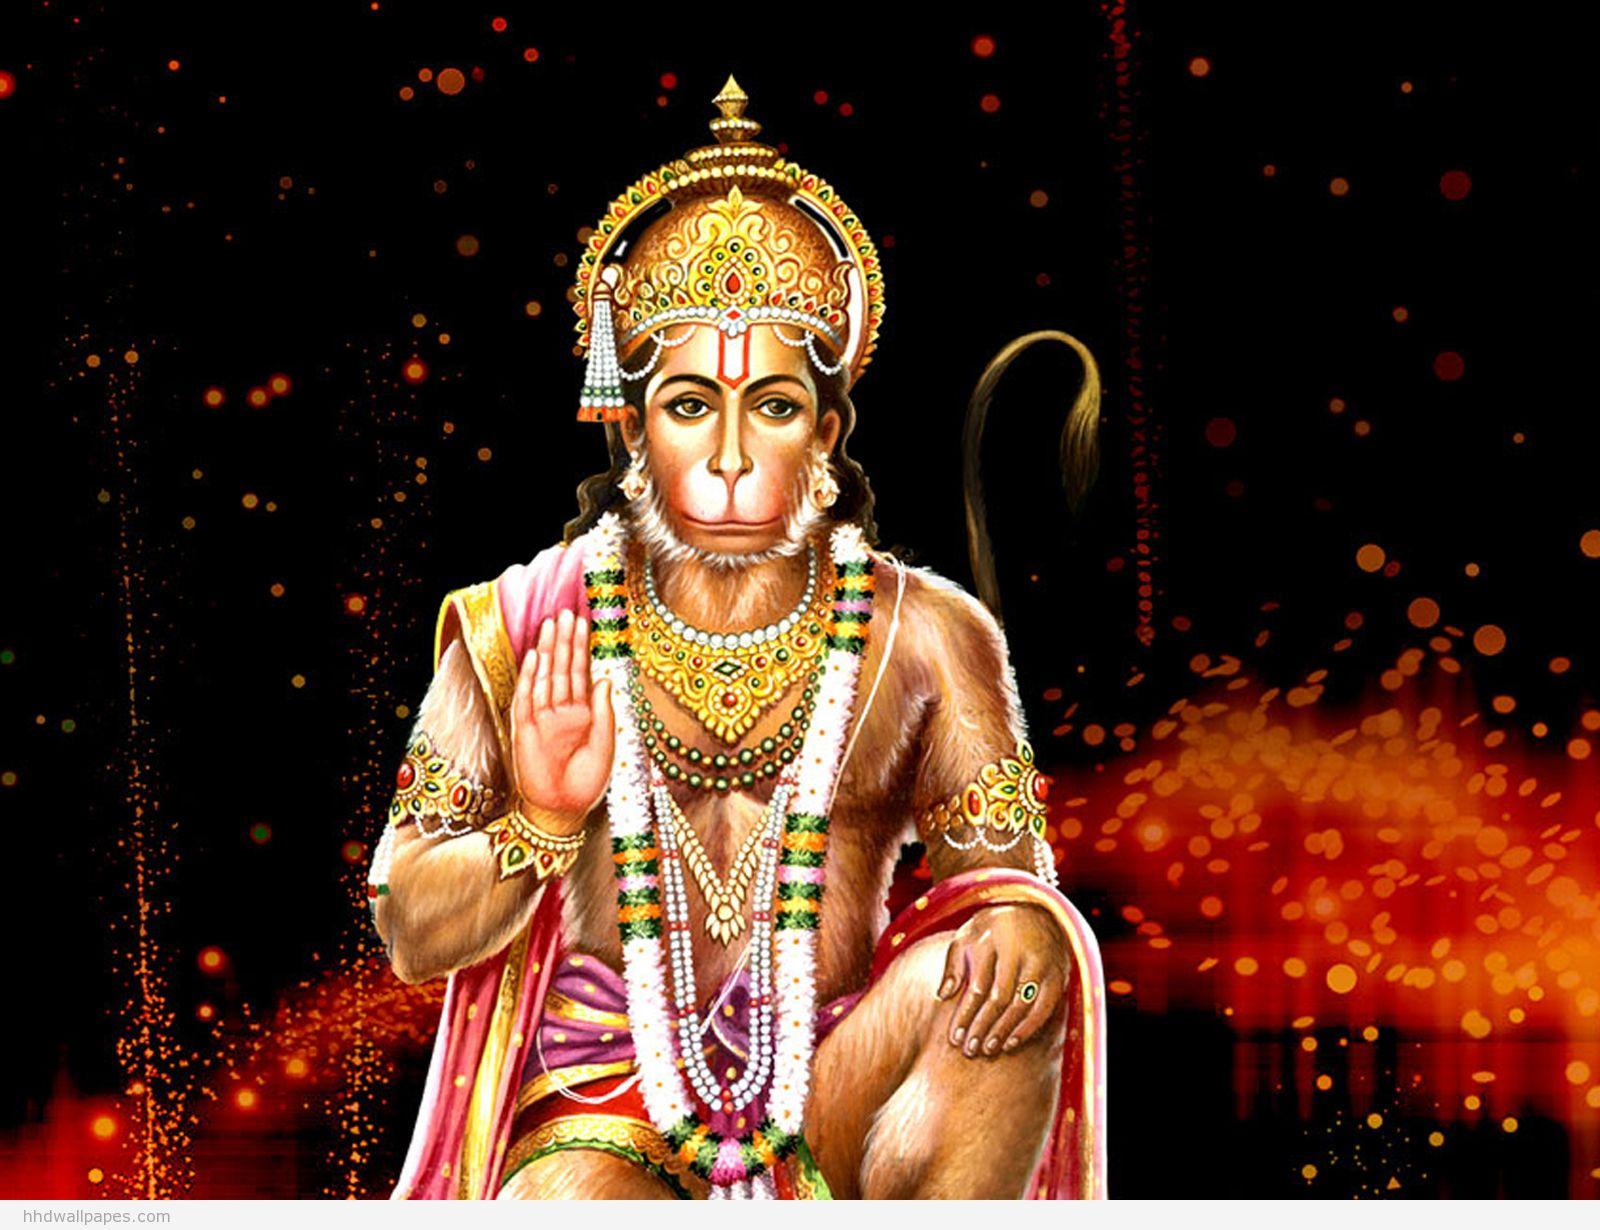 Hd wallpaper of hanuman - 12 Hanuman Wallpapers Best Wallpapers Hd Backgrounds Wallpapers